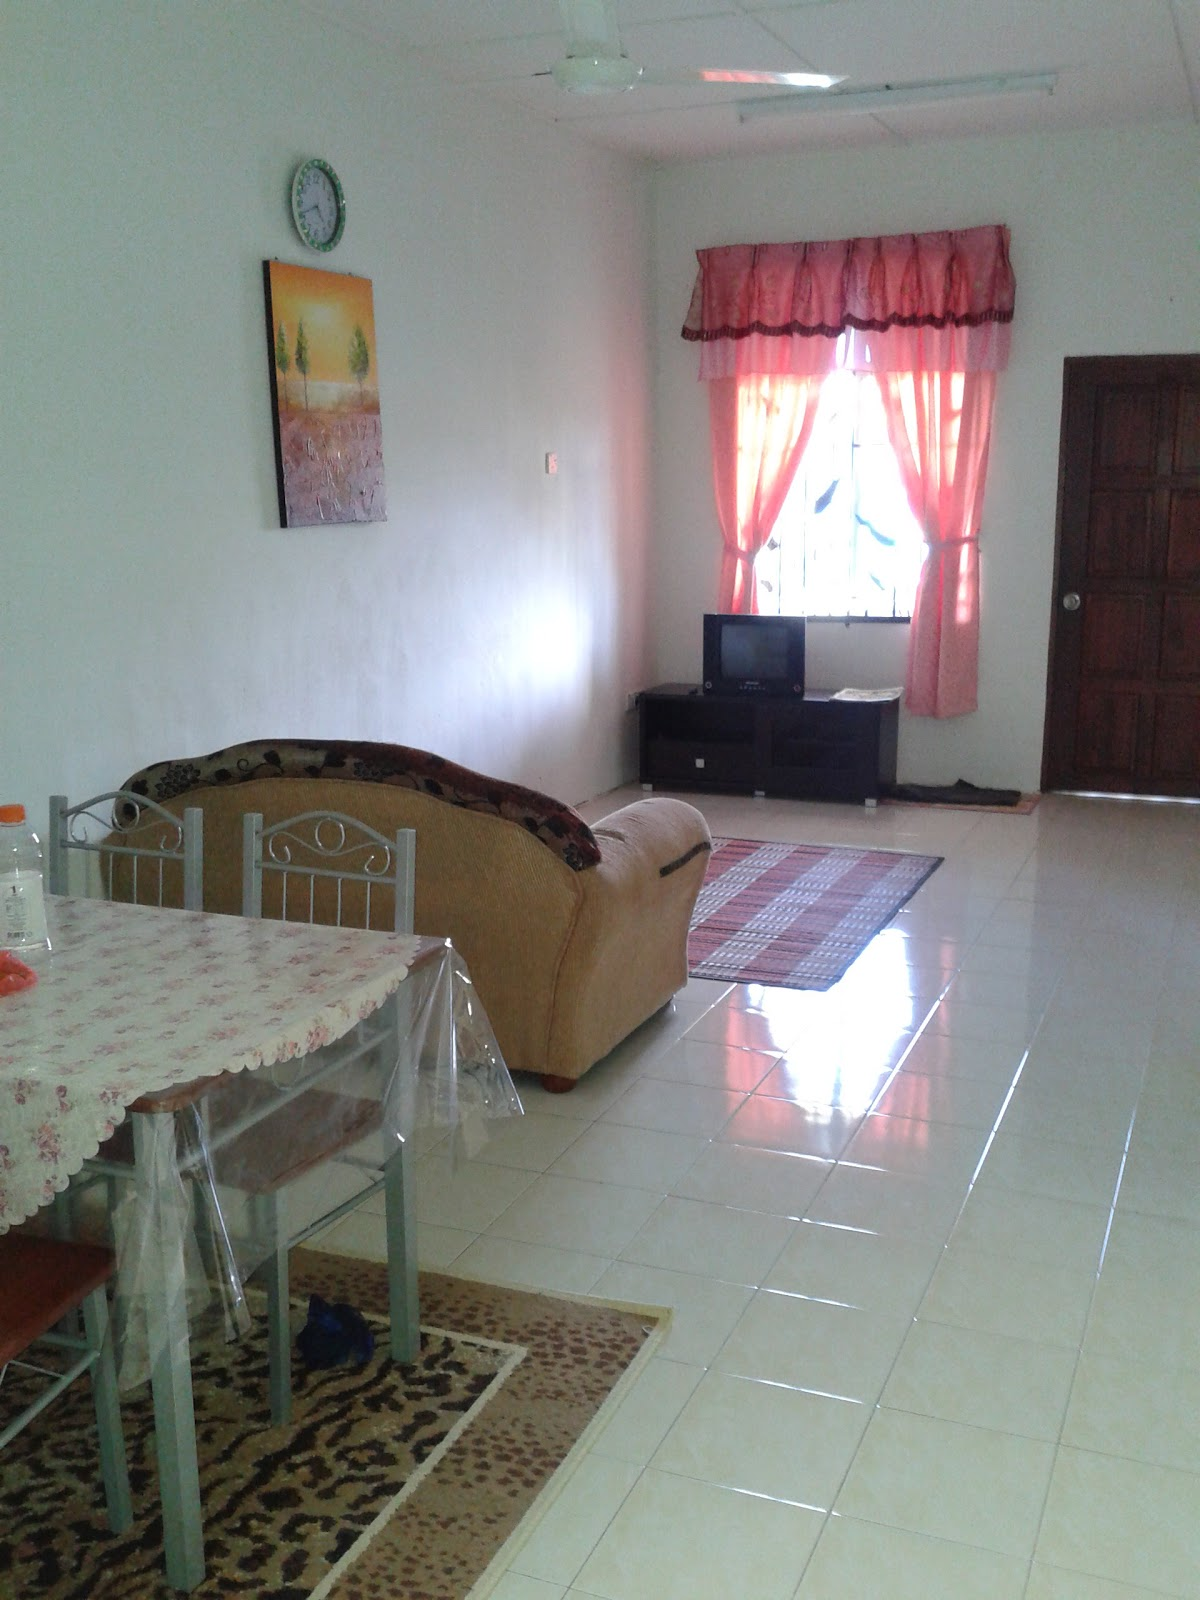 Homestay Dekat Pekan Pahang RM150 Bukit Gambang RM 180 Call 019 951 1971 Cikguazis